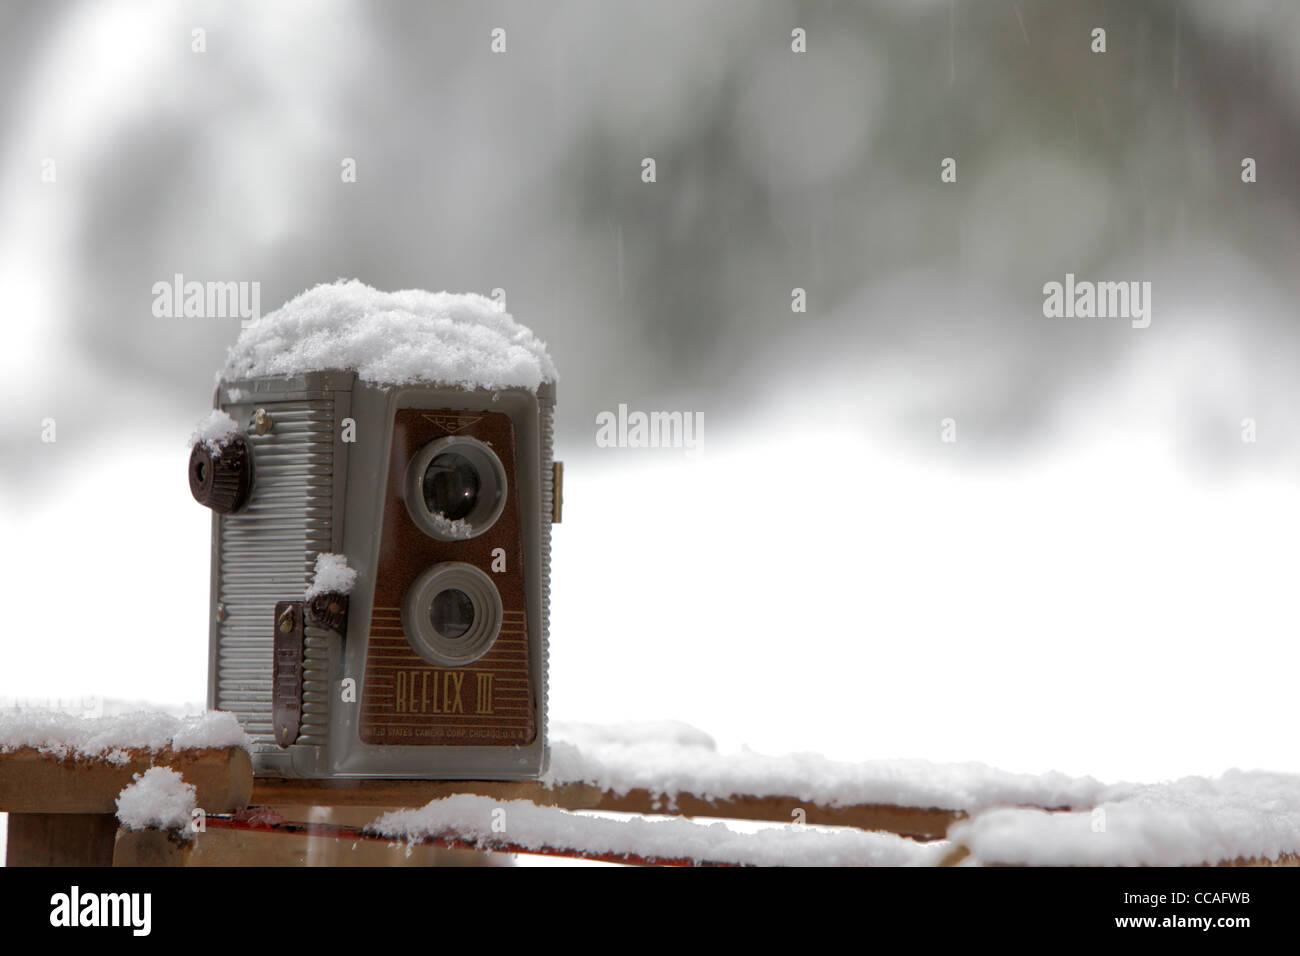 twin lens reflex camera in snow - Stock Image